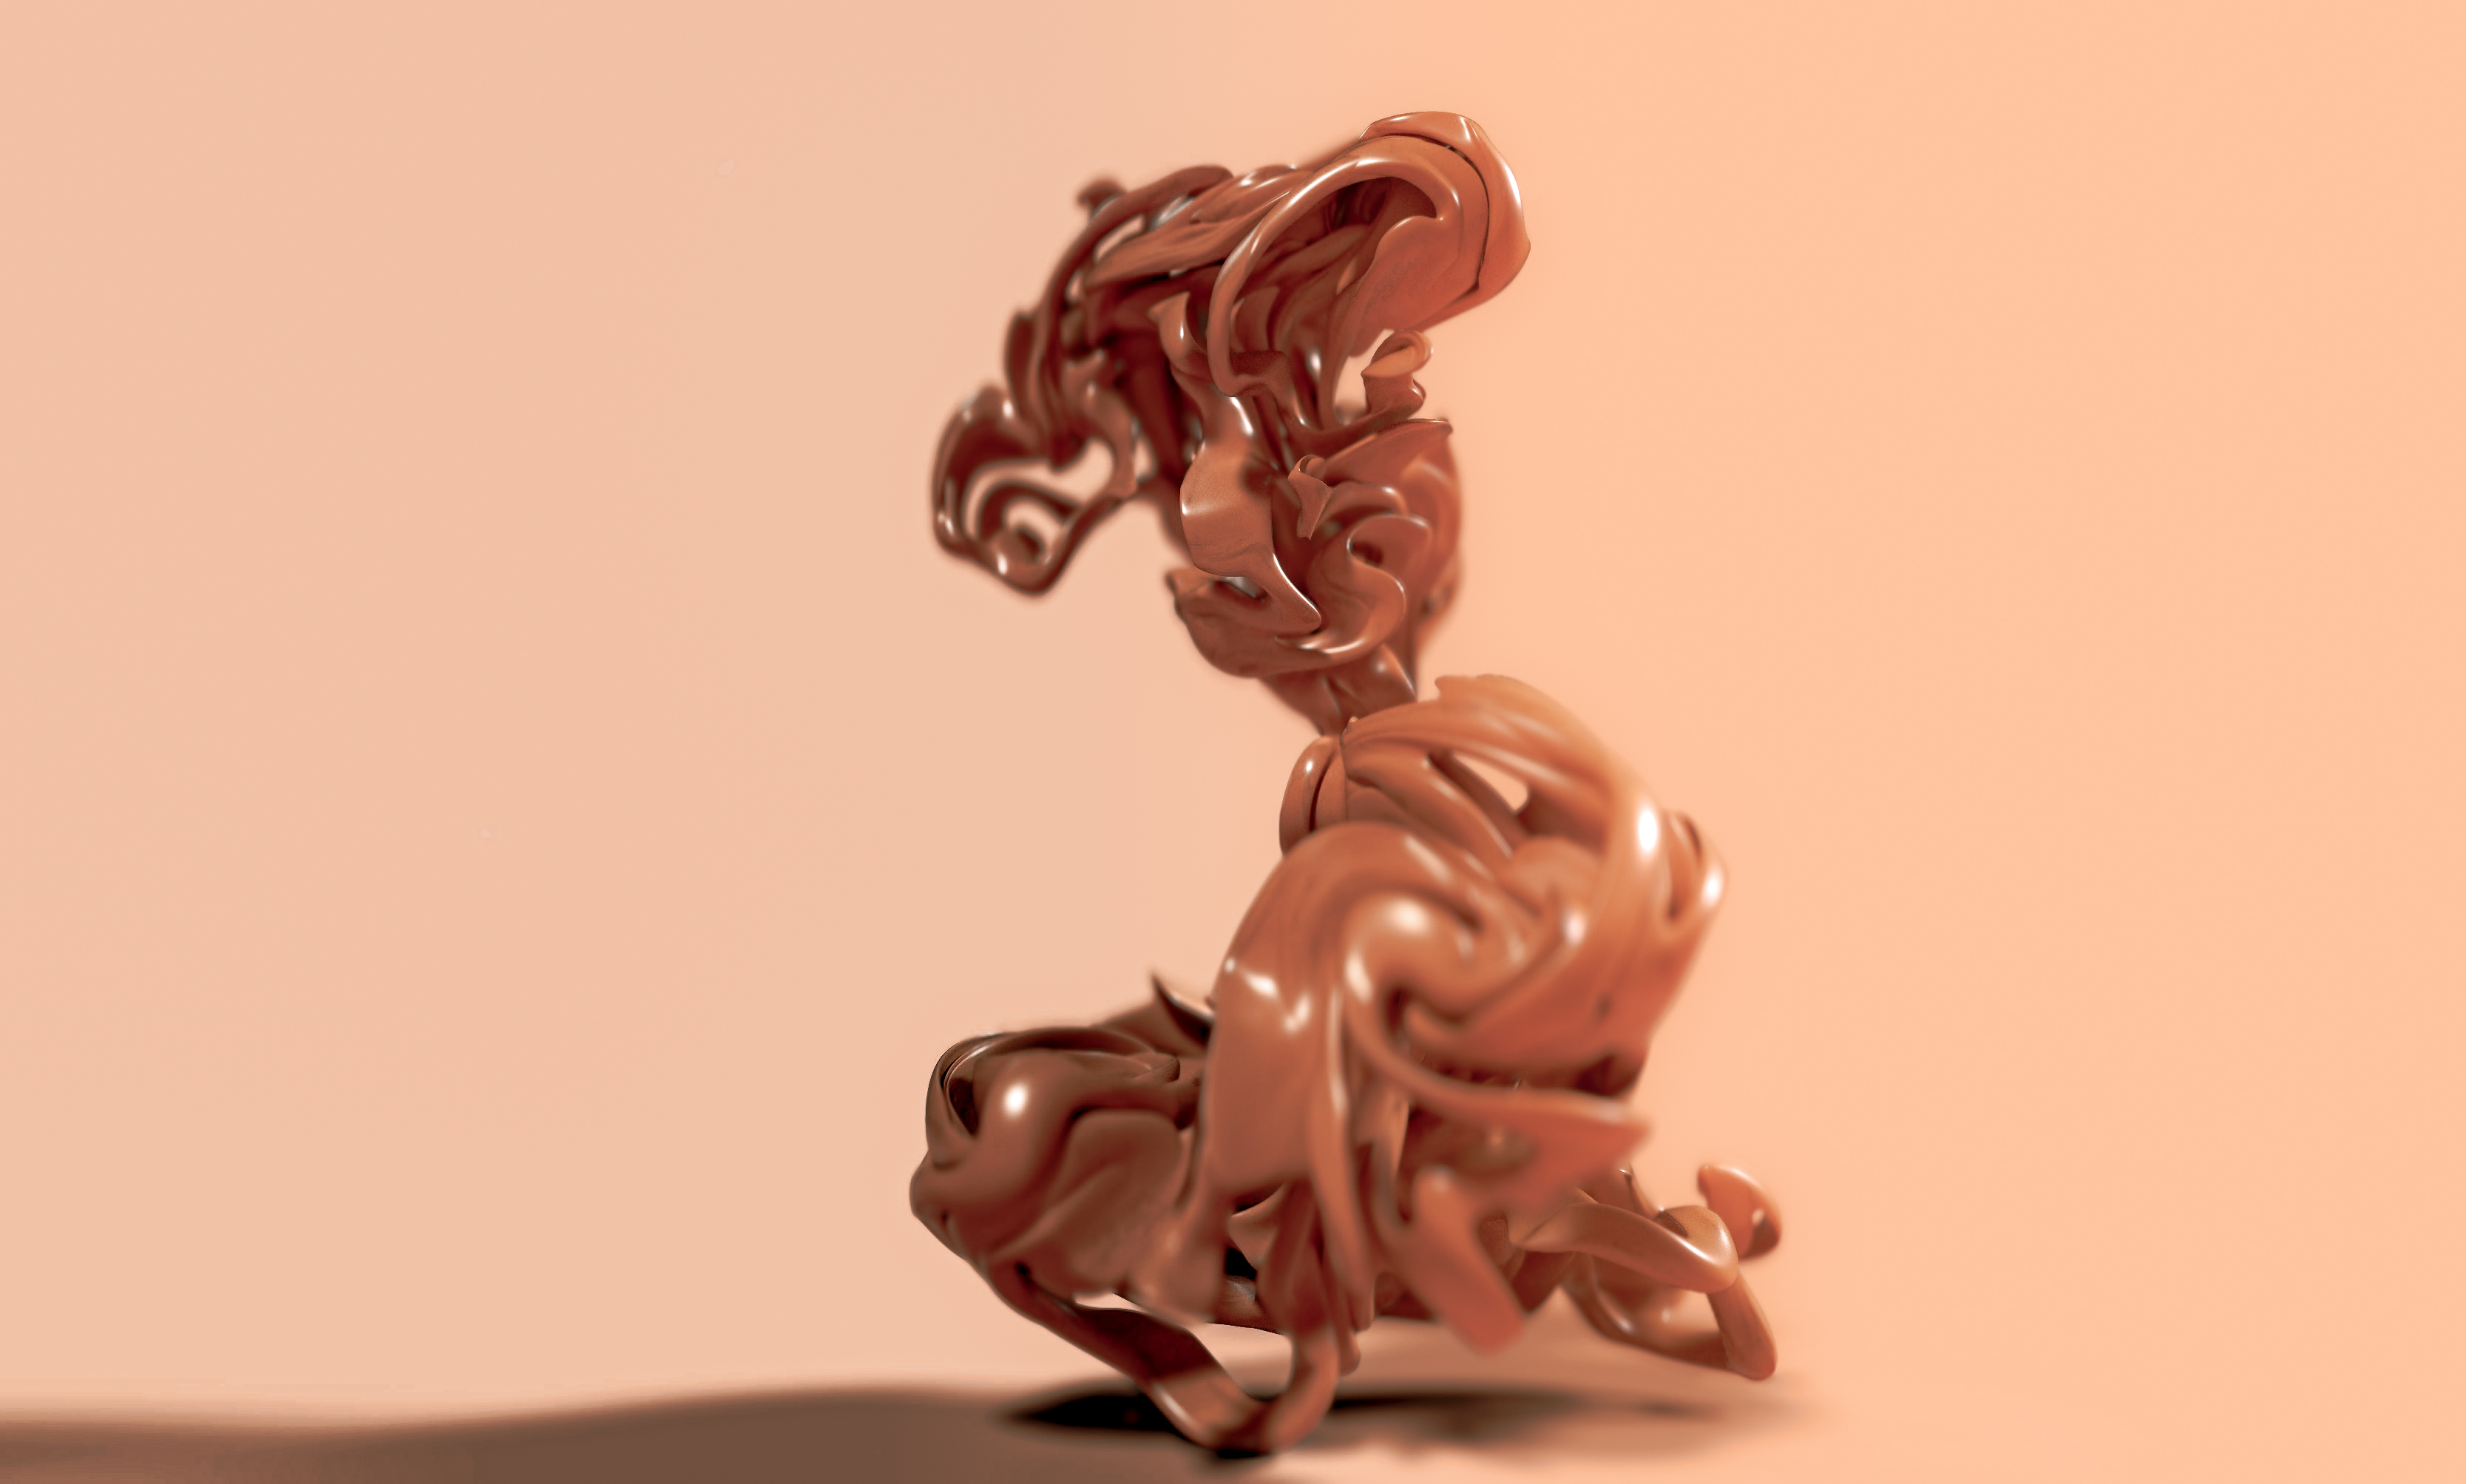 Abstract Sculpture Wood 3D